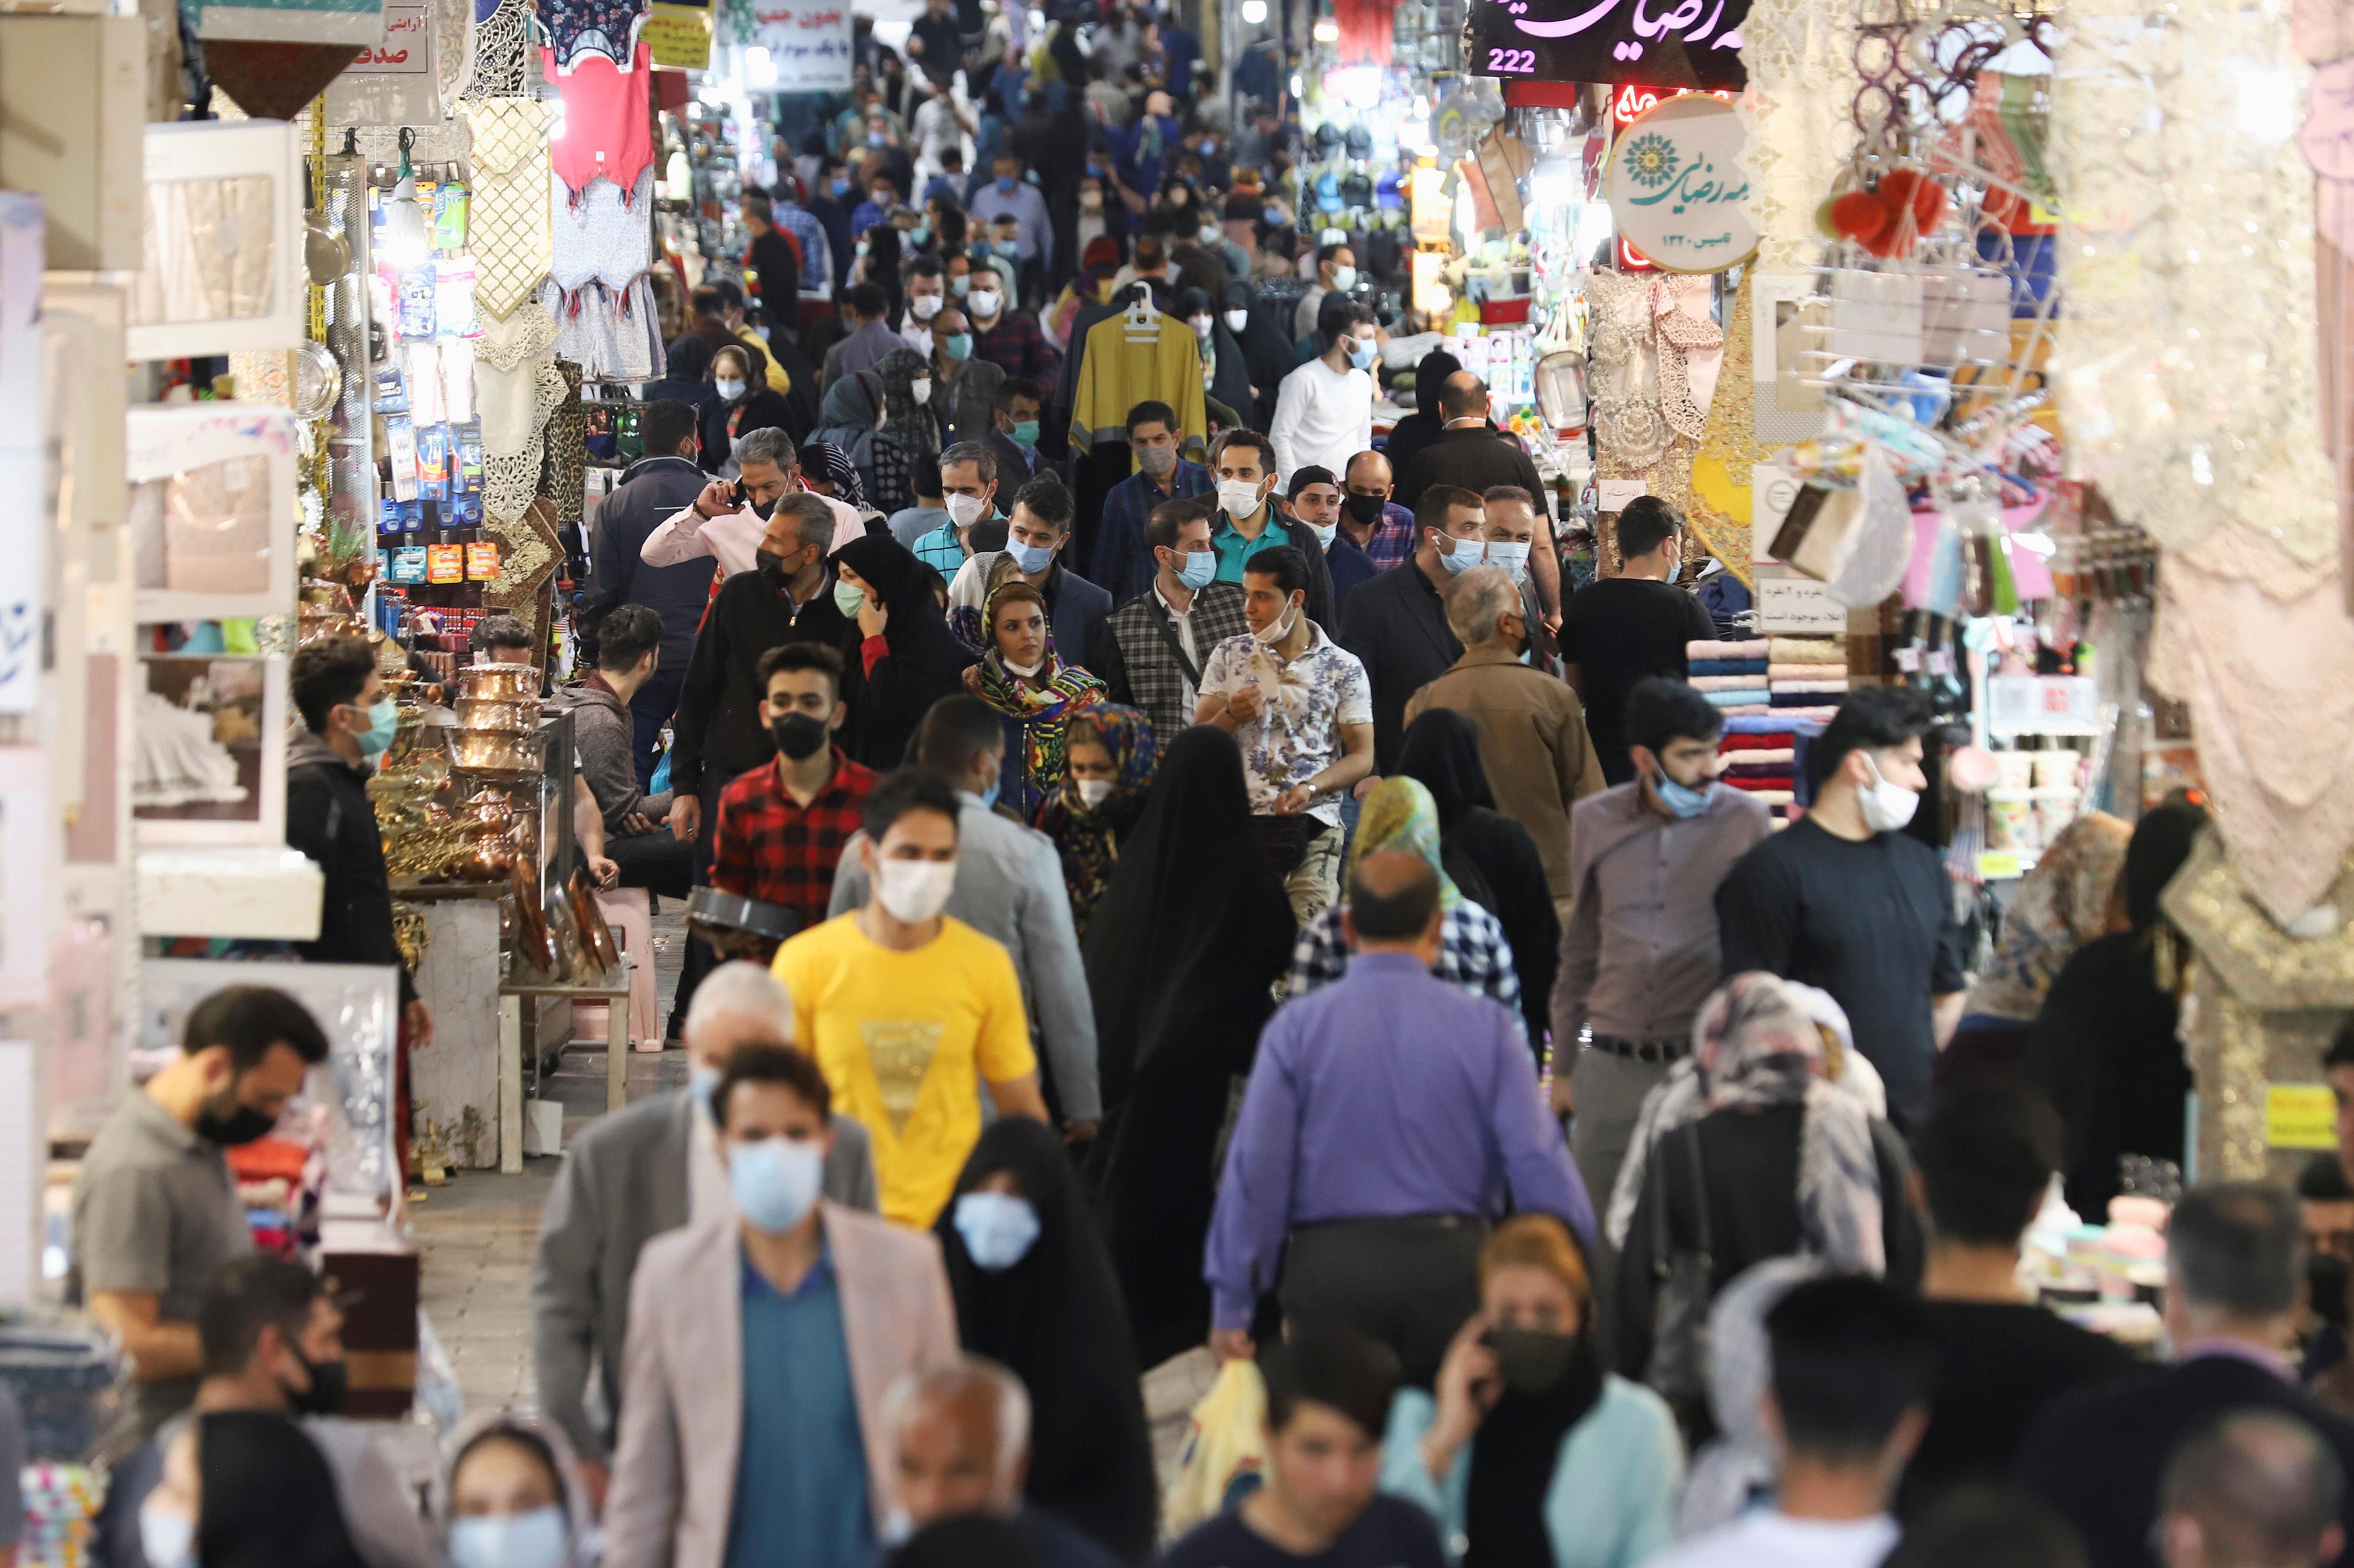 Iranian people walk in Tehran Bazaar, in Tehran, Iran April 6, 2021. Majid Asgaripour/WANA (West Asia News Agency) via REUTERS